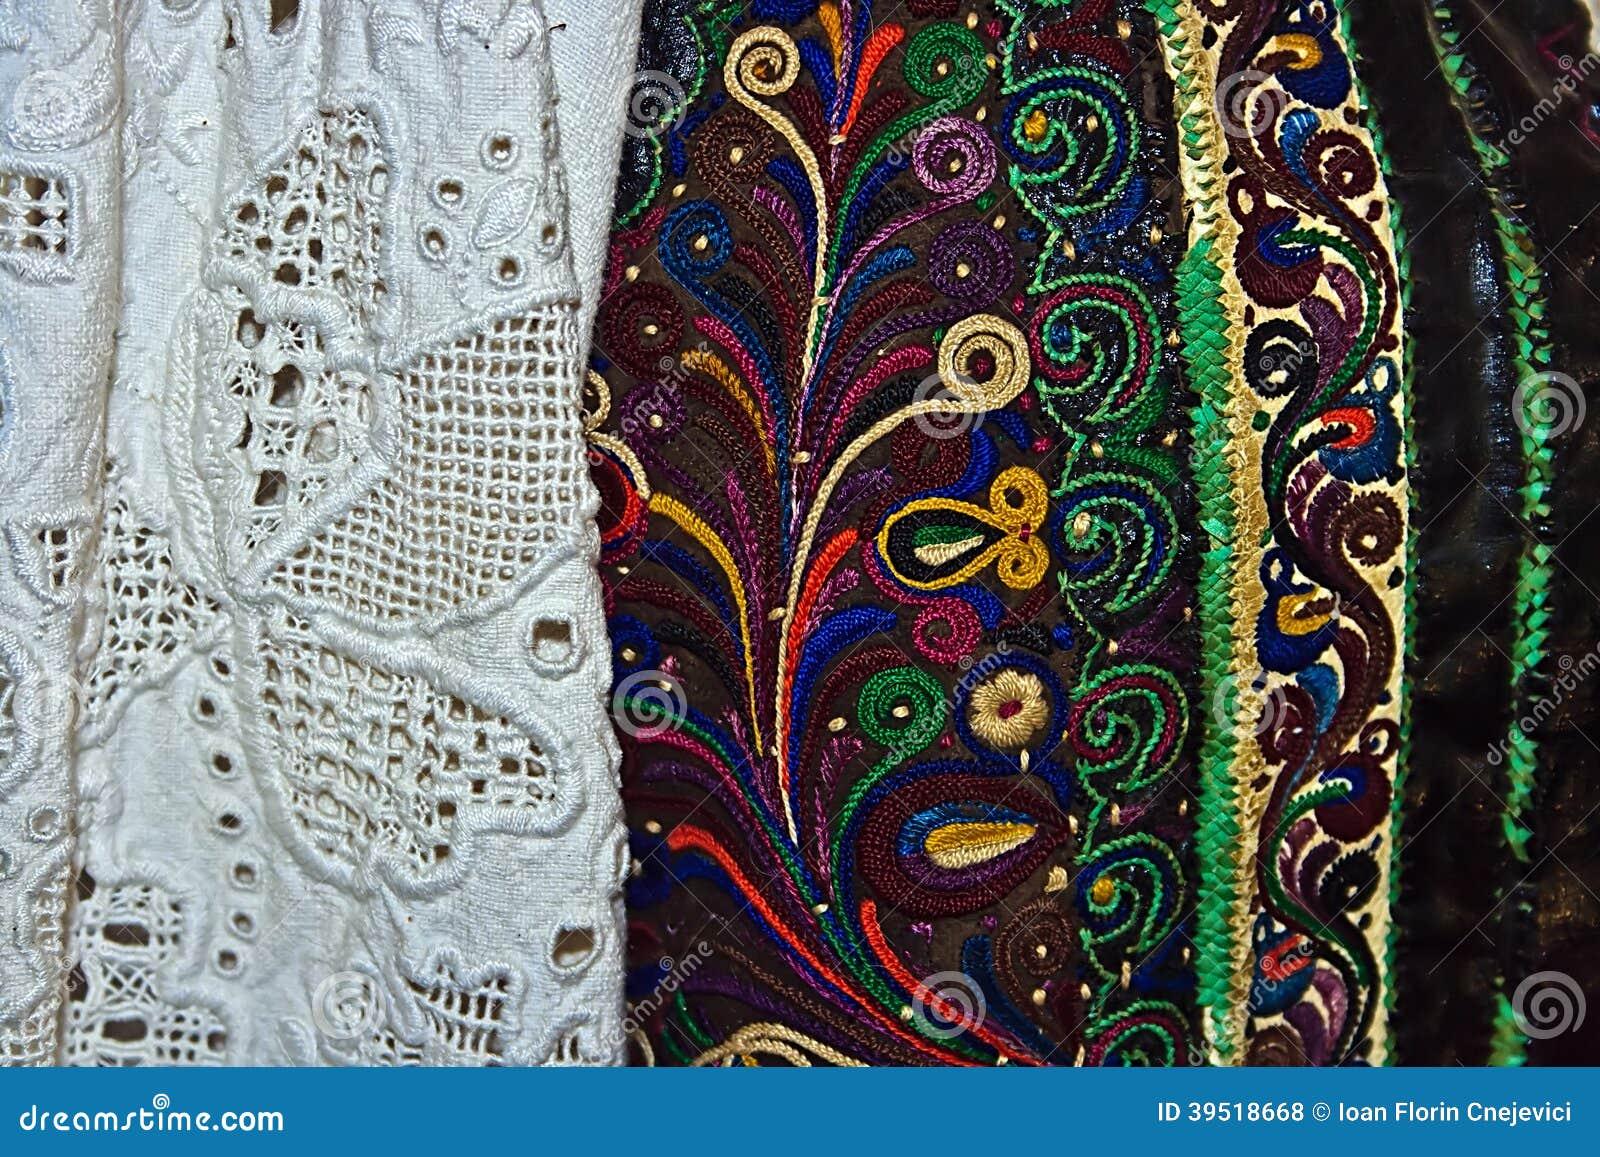 Traje popular rumano tradicional. Detalle 15